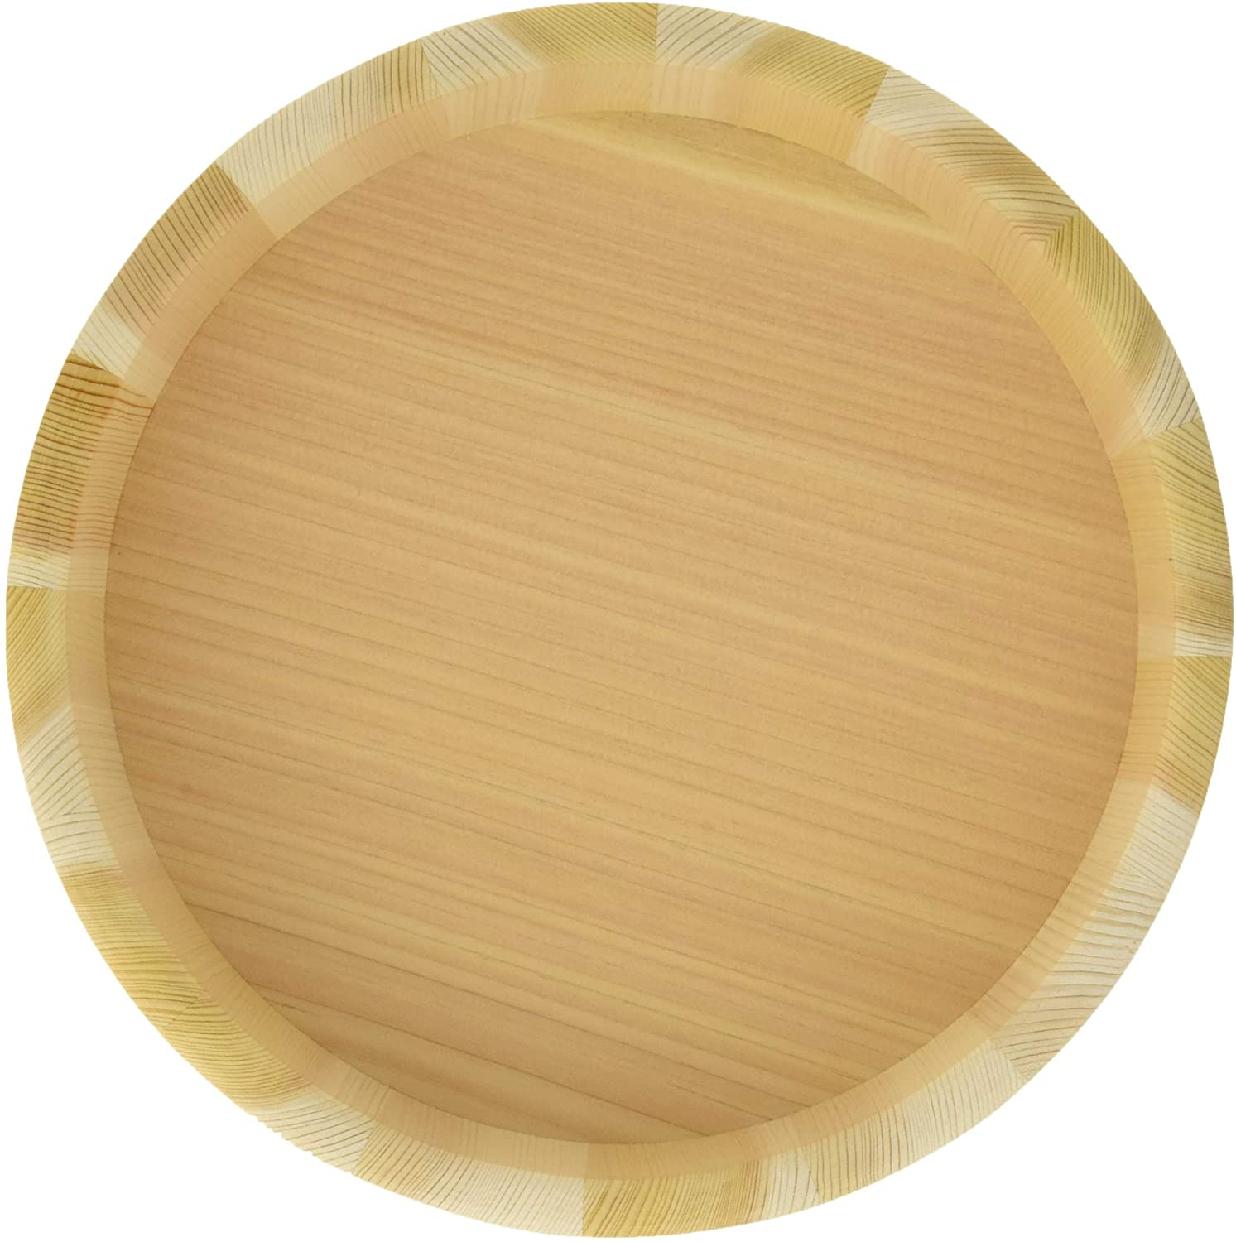 星野工業 飯台 寿司桶 24cmの商品画像3